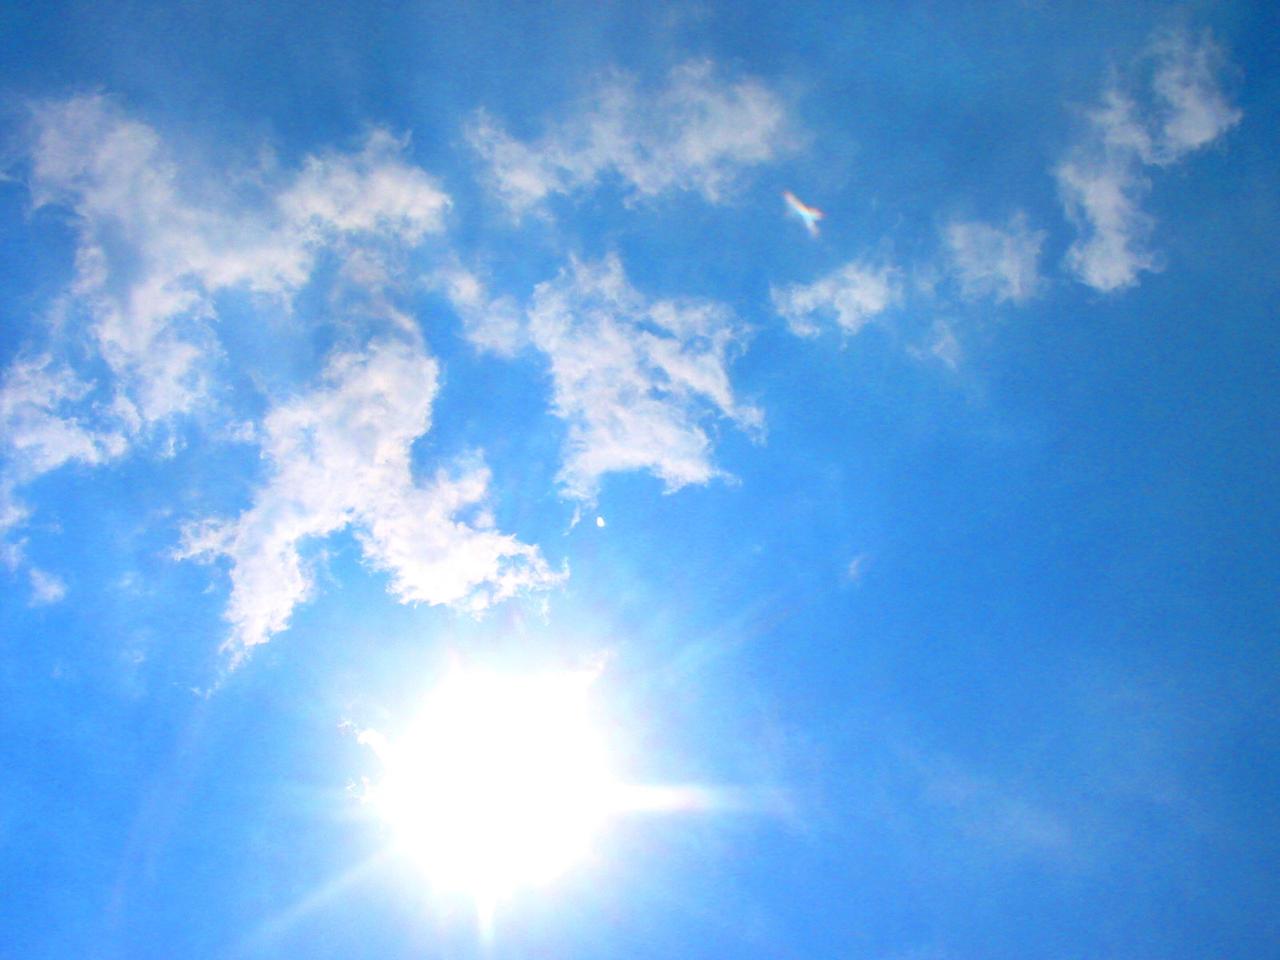 noon solar astronomy - photo #22